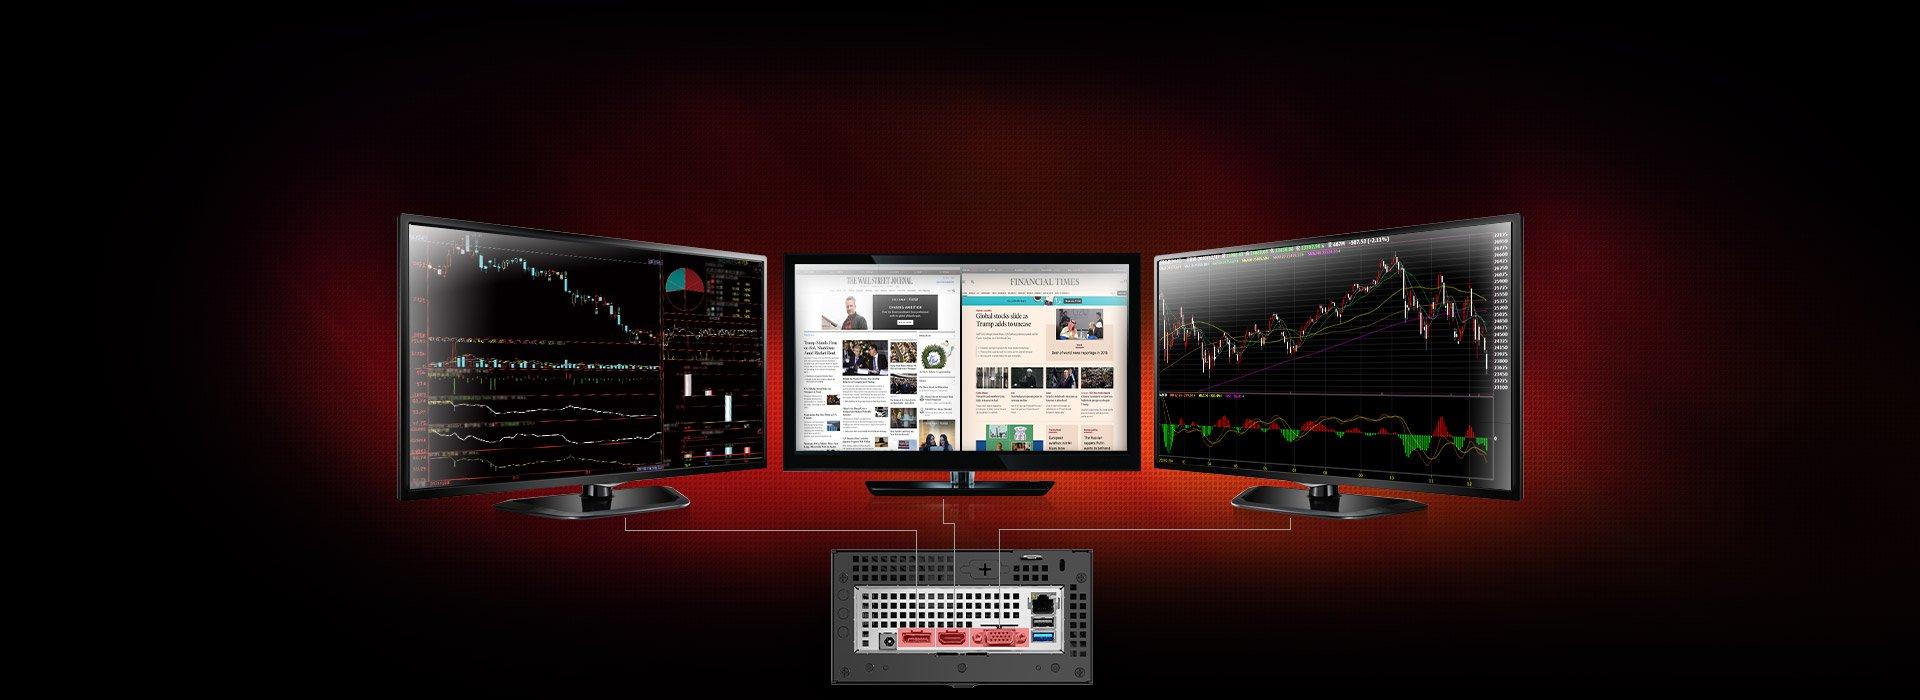 ASRock > DeskMini A300 Series